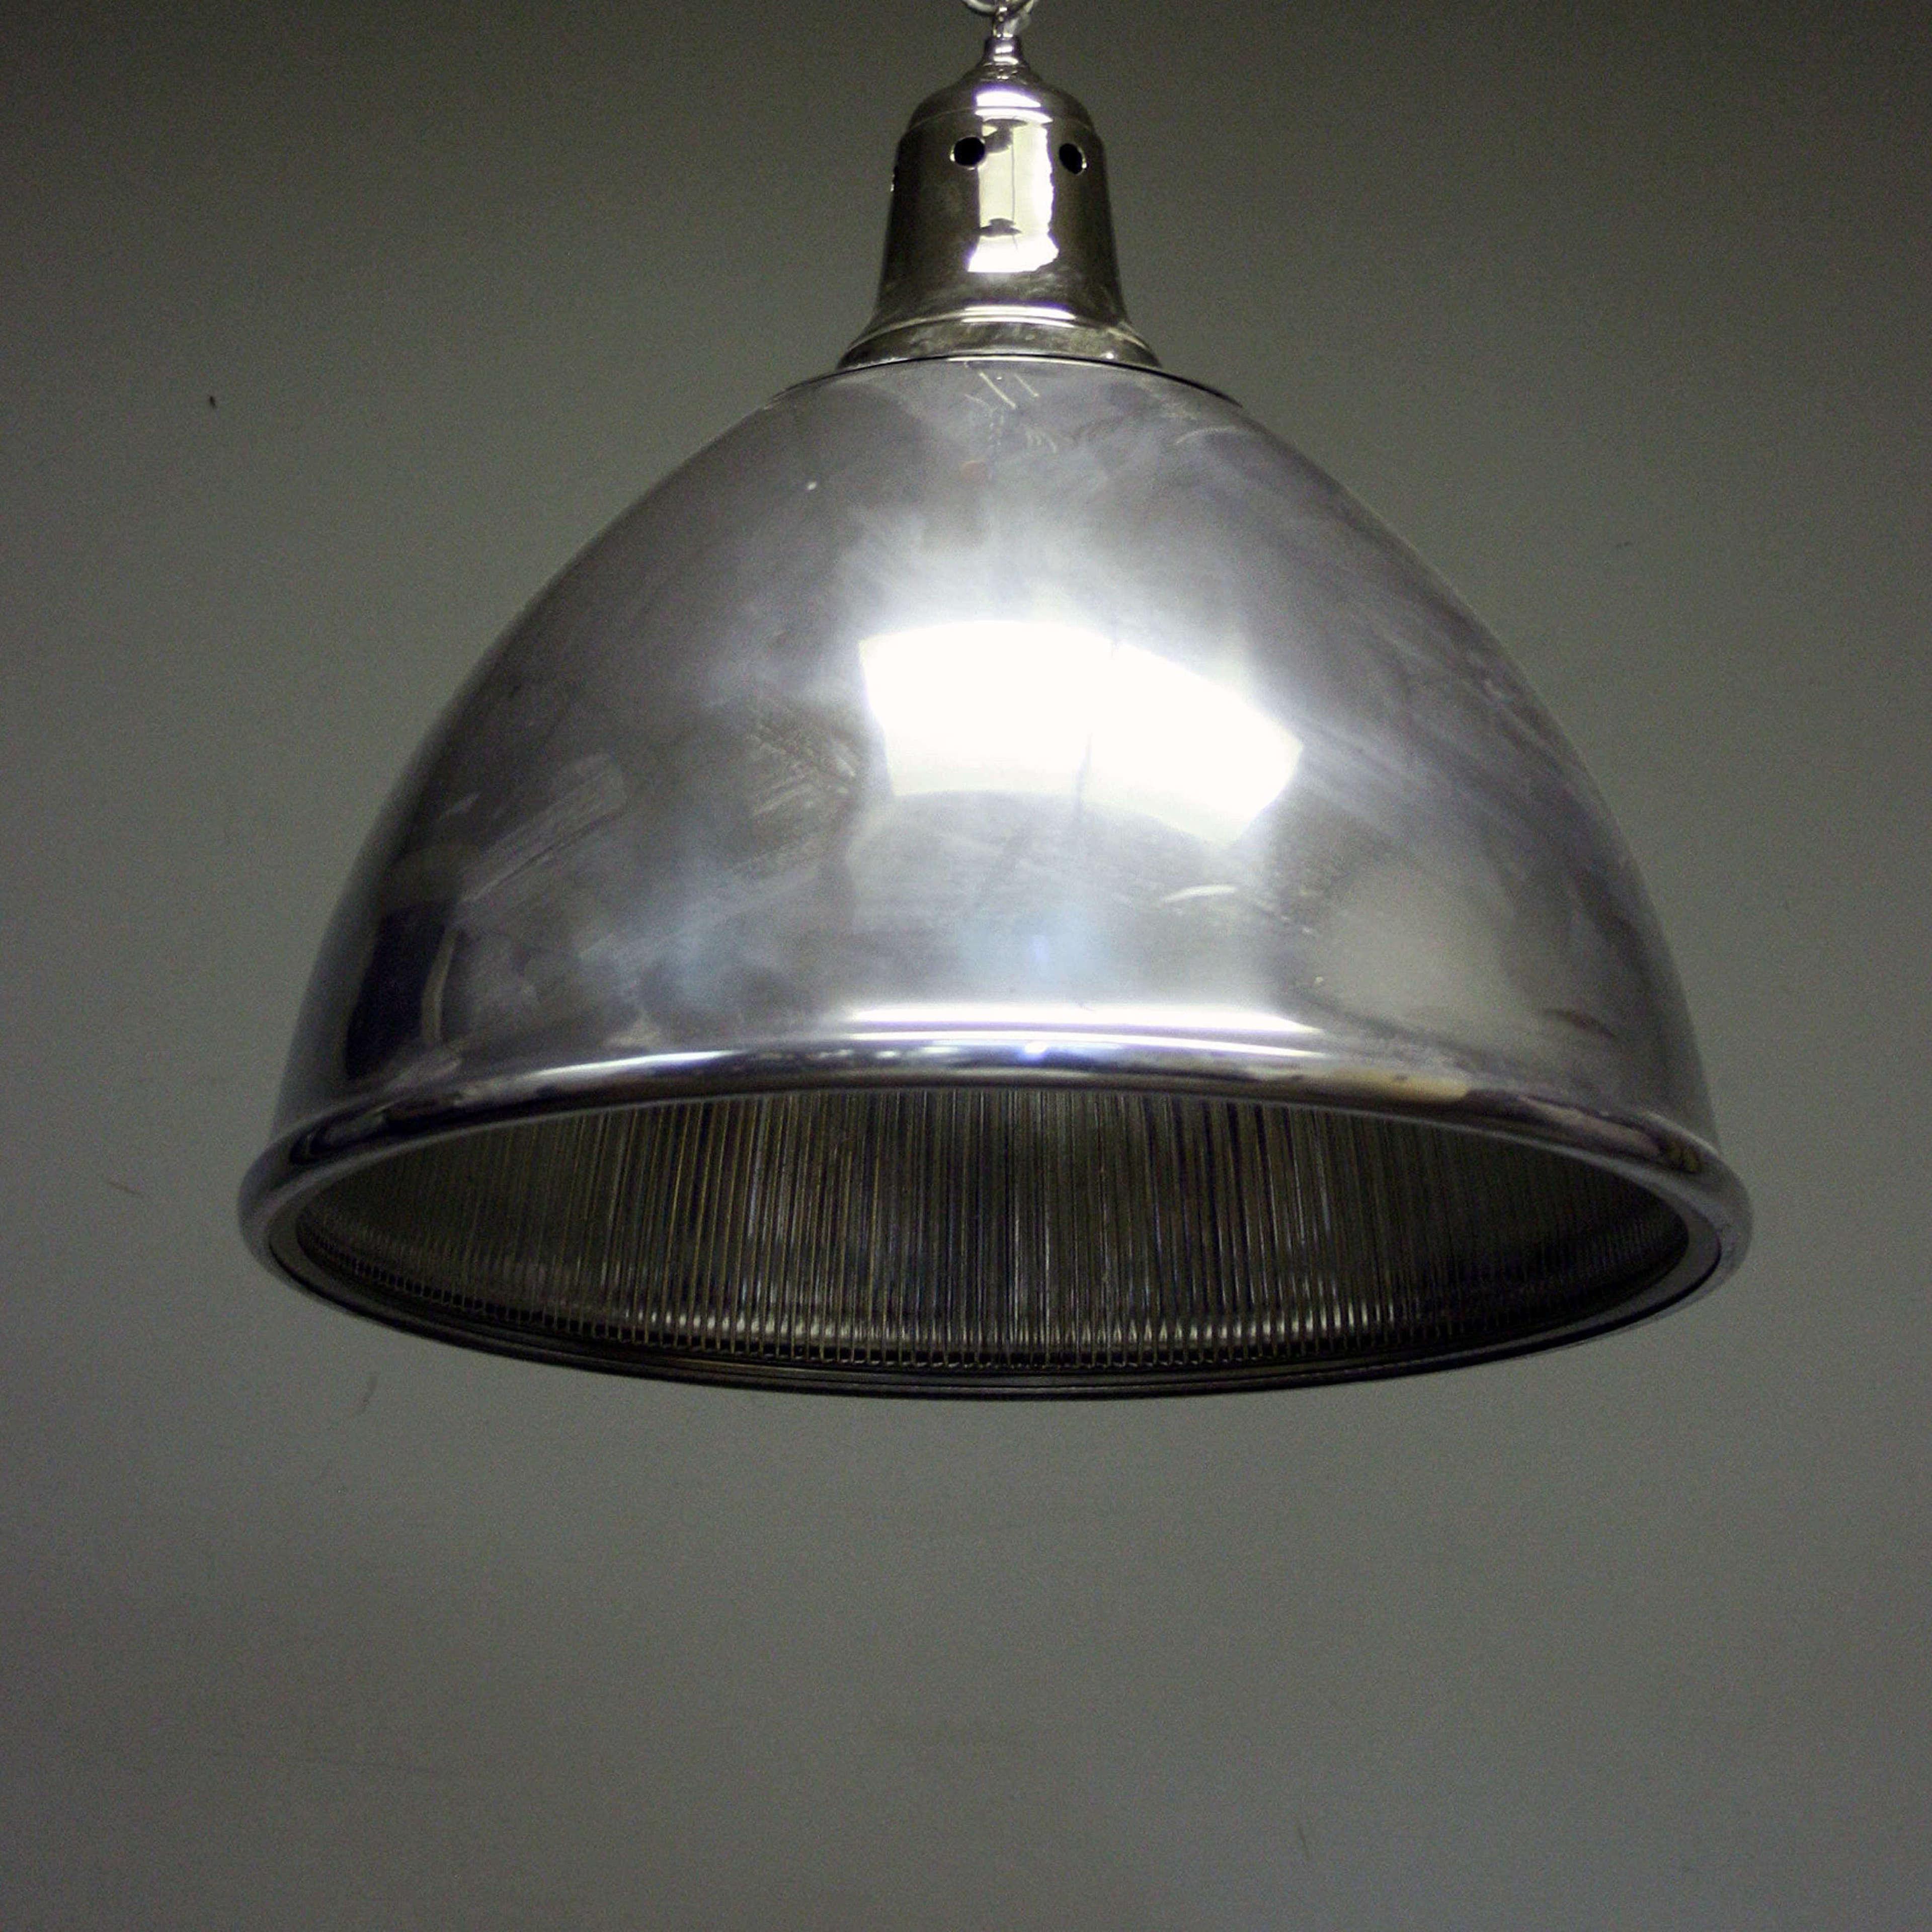 Polished Metal and Holophane Ceiling Light